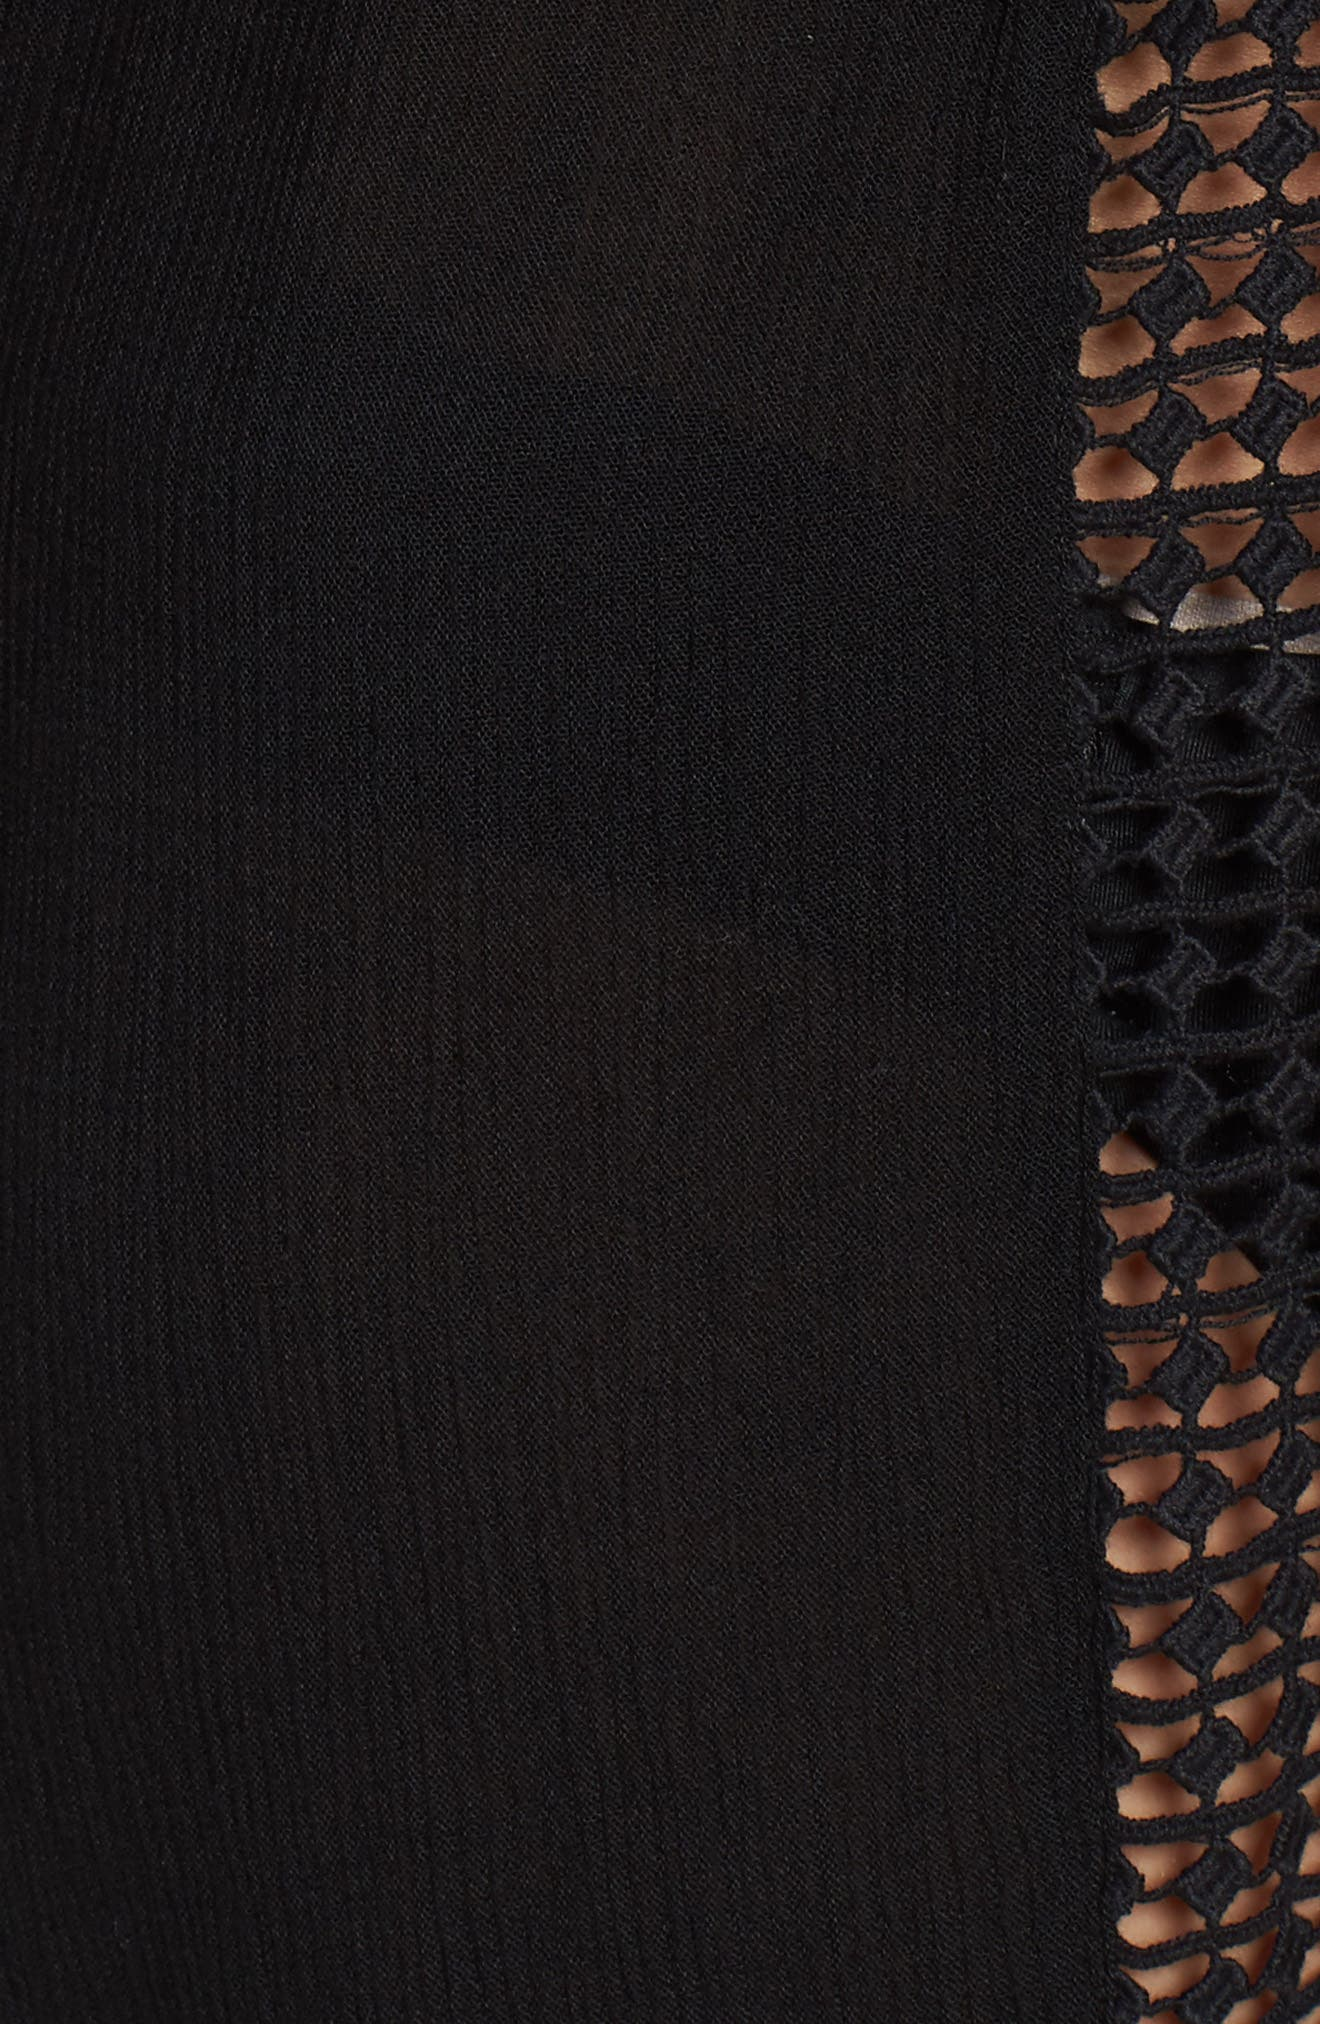 Crochet Cover-Up Tunic,                             Alternate thumbnail 5, color,                             Black